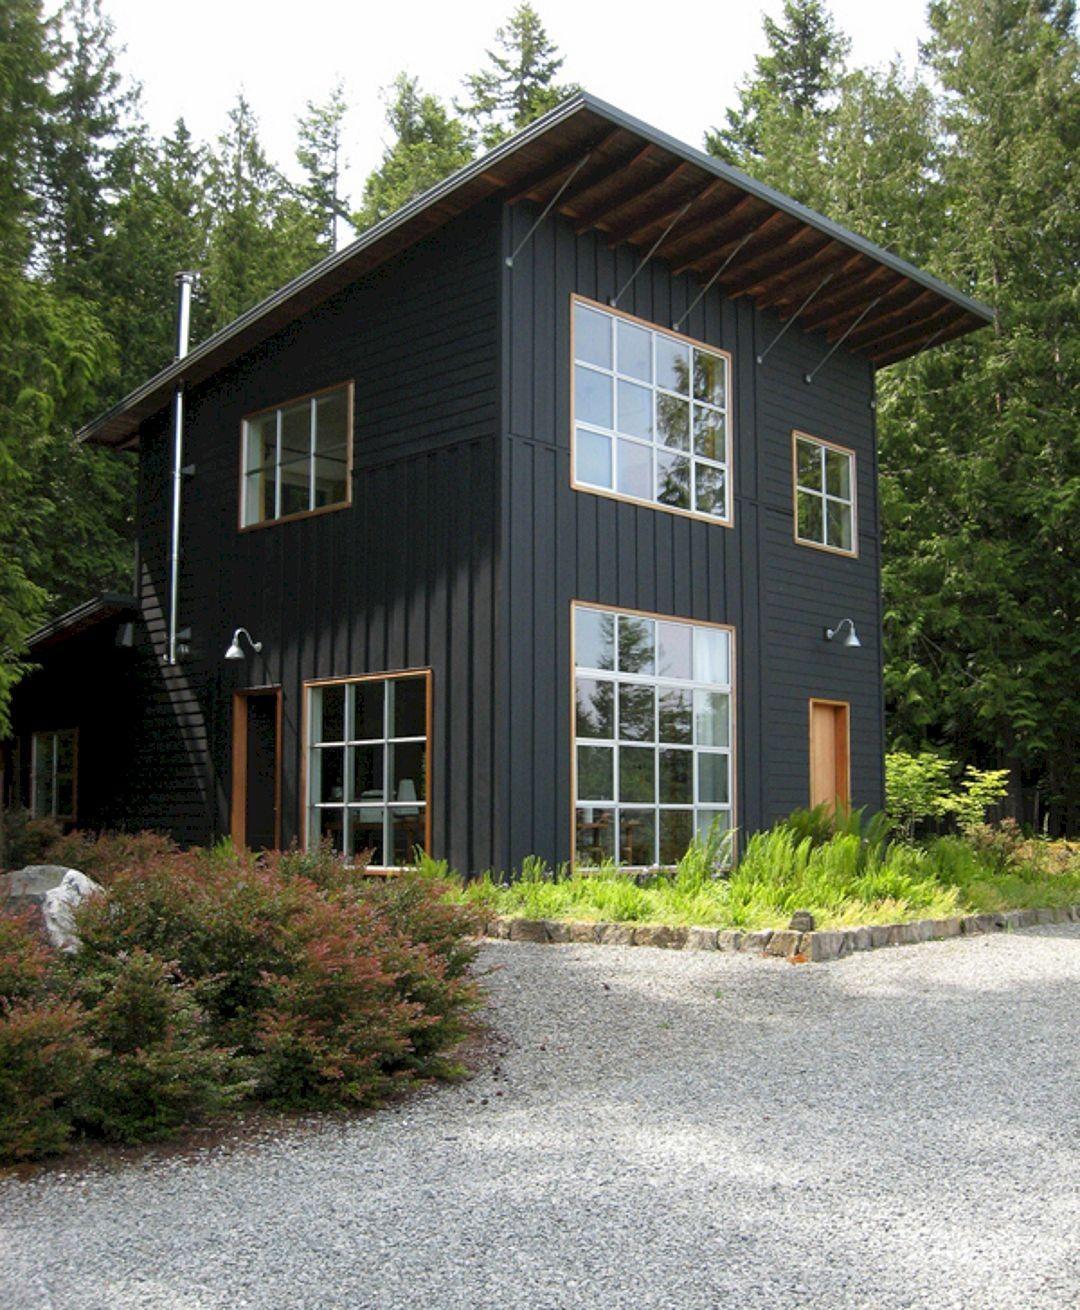 Modern Homeexterior Design Ideas: 40+ Amazing Rustic Home Exterior Designs Ideas